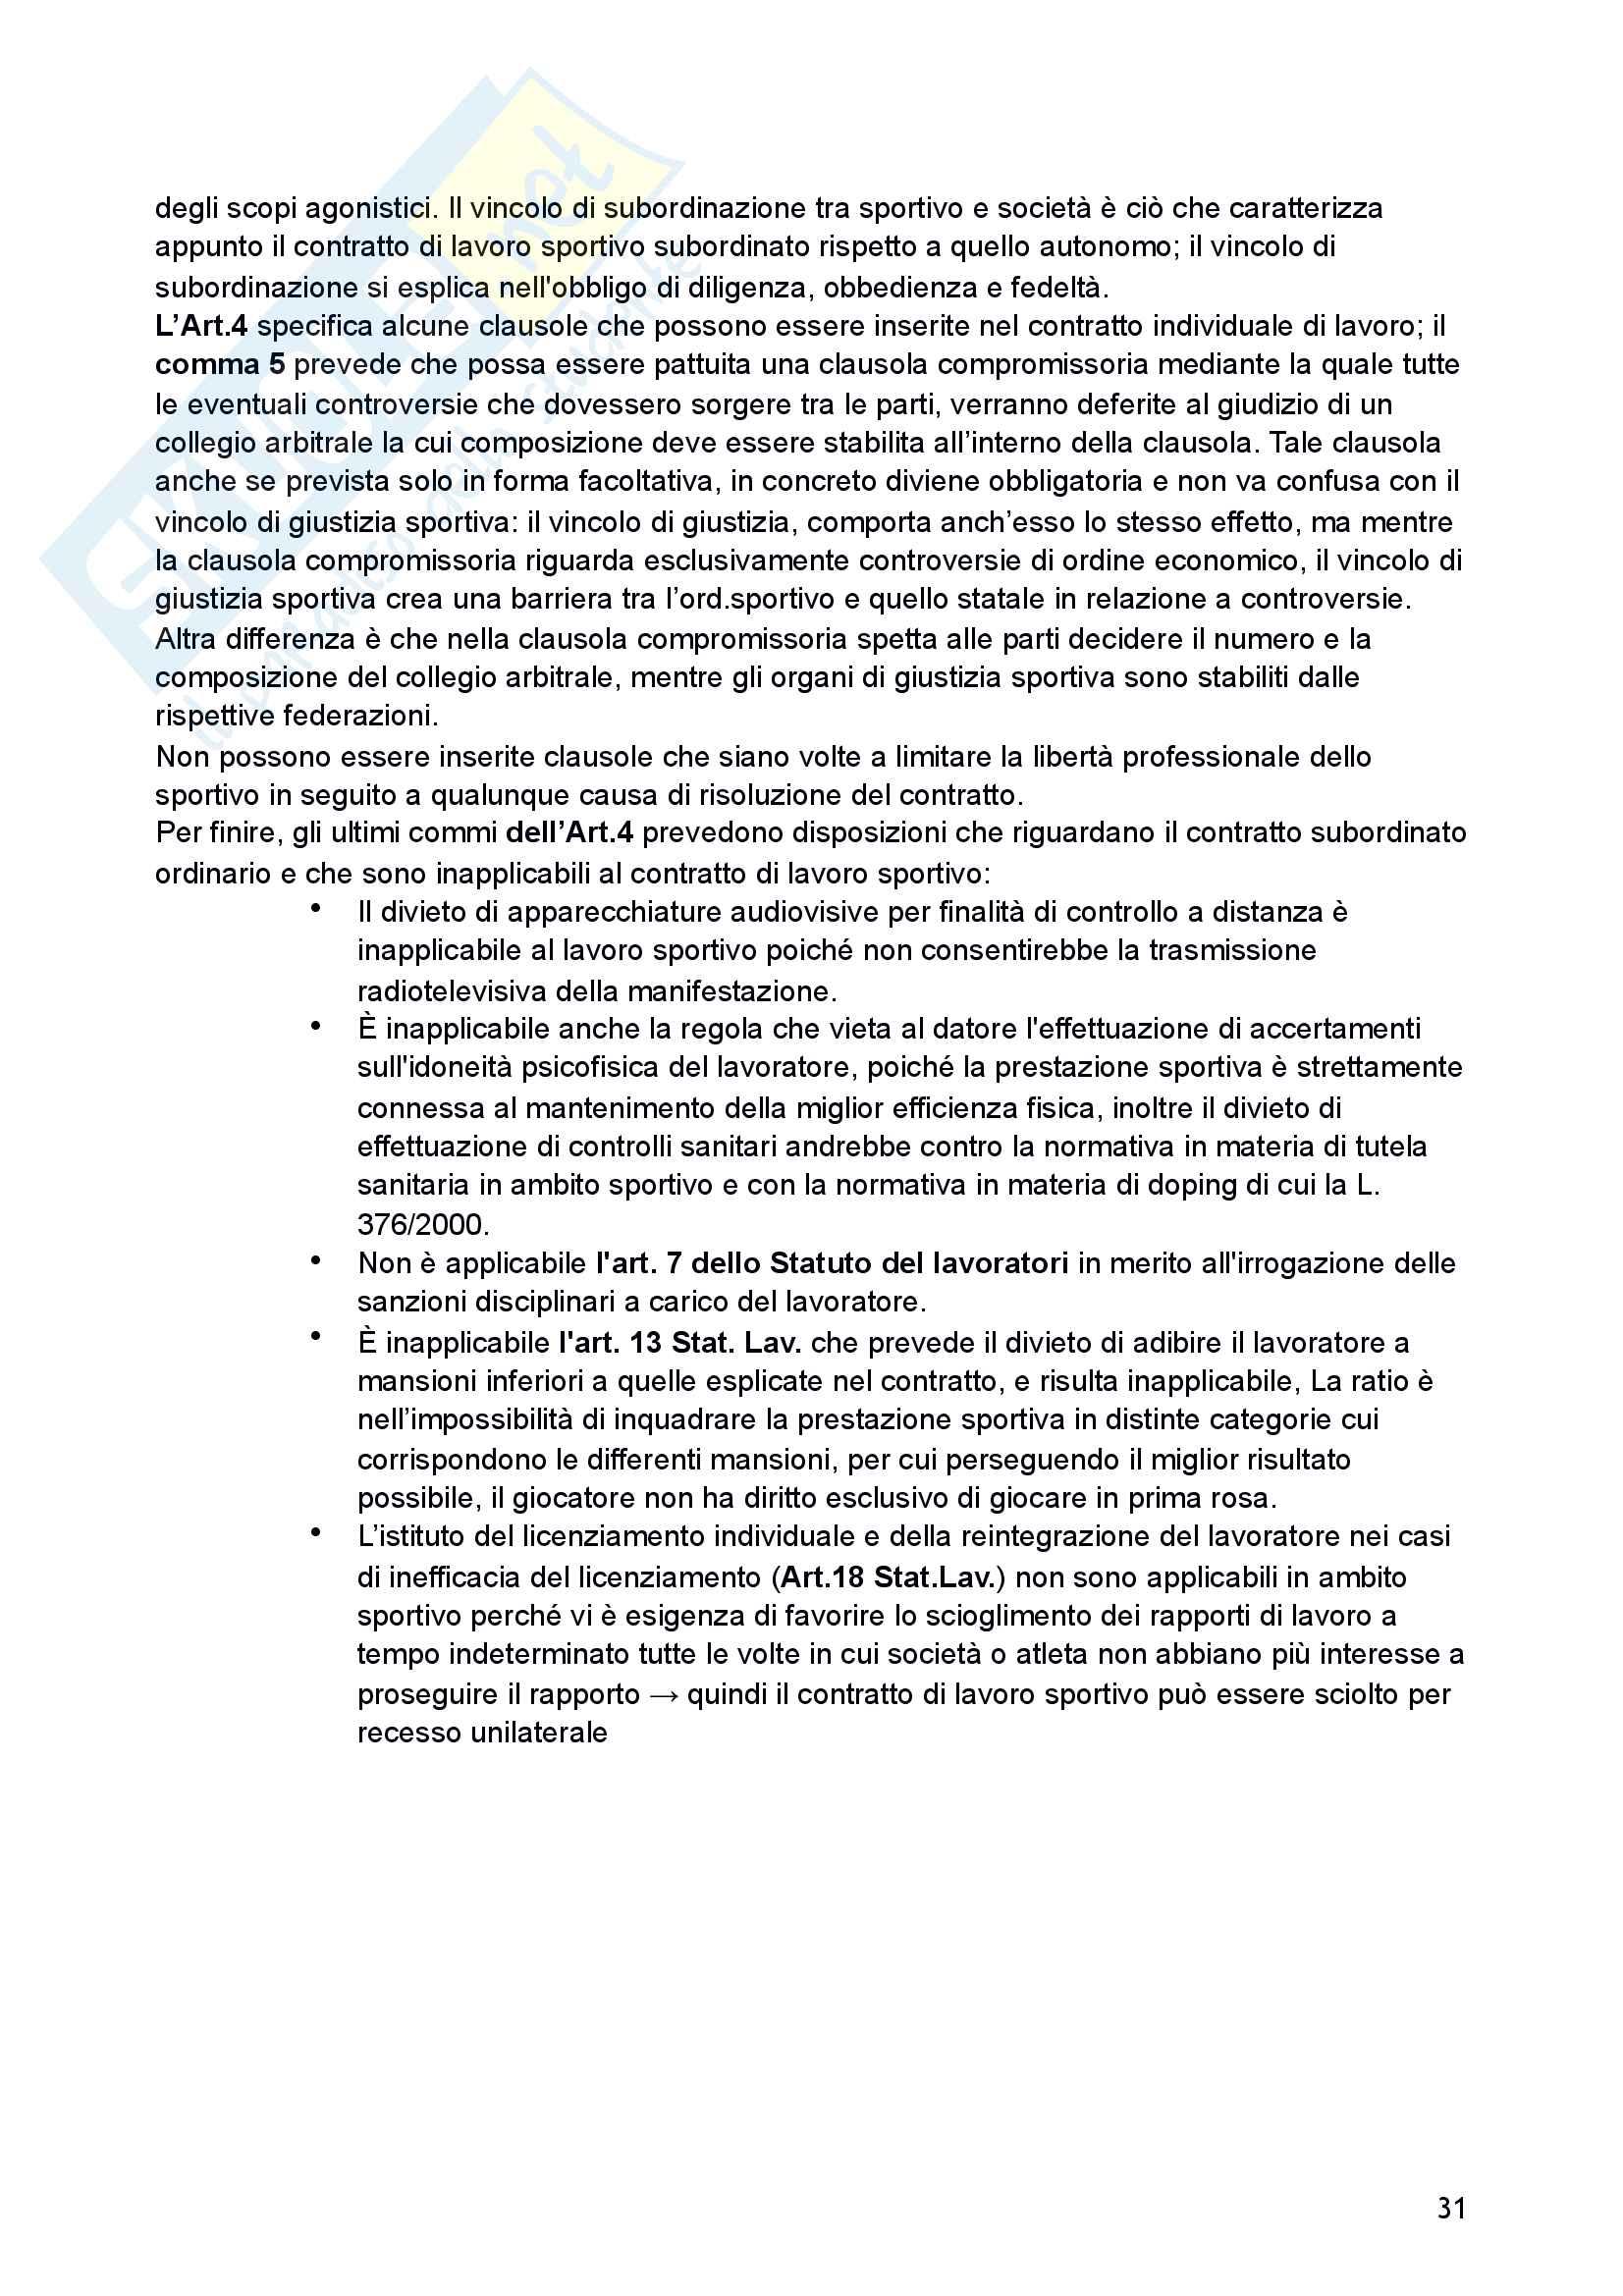 Riassunto esame di Diritto sportivo Pag. 31